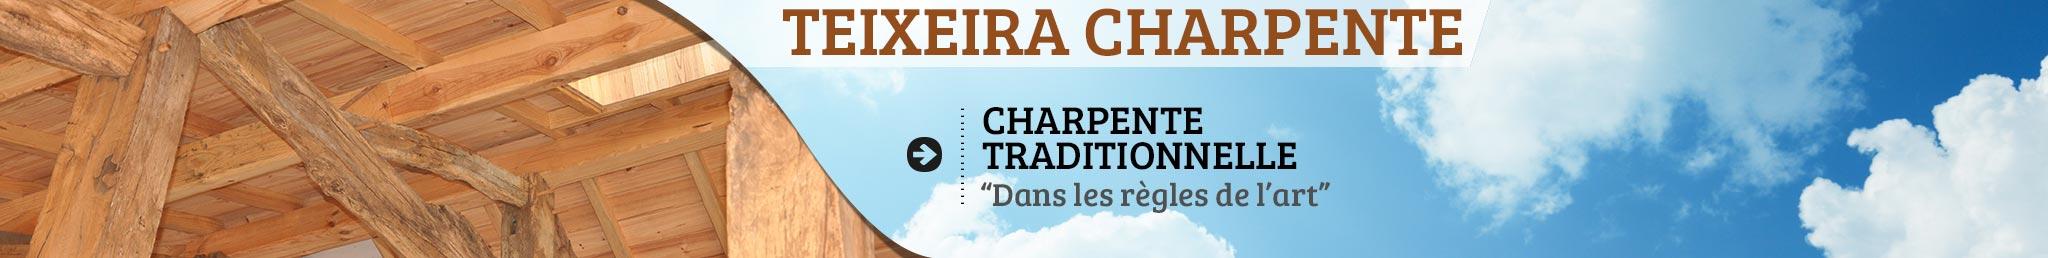 teixeira-charpente-traditionnelle-landaise